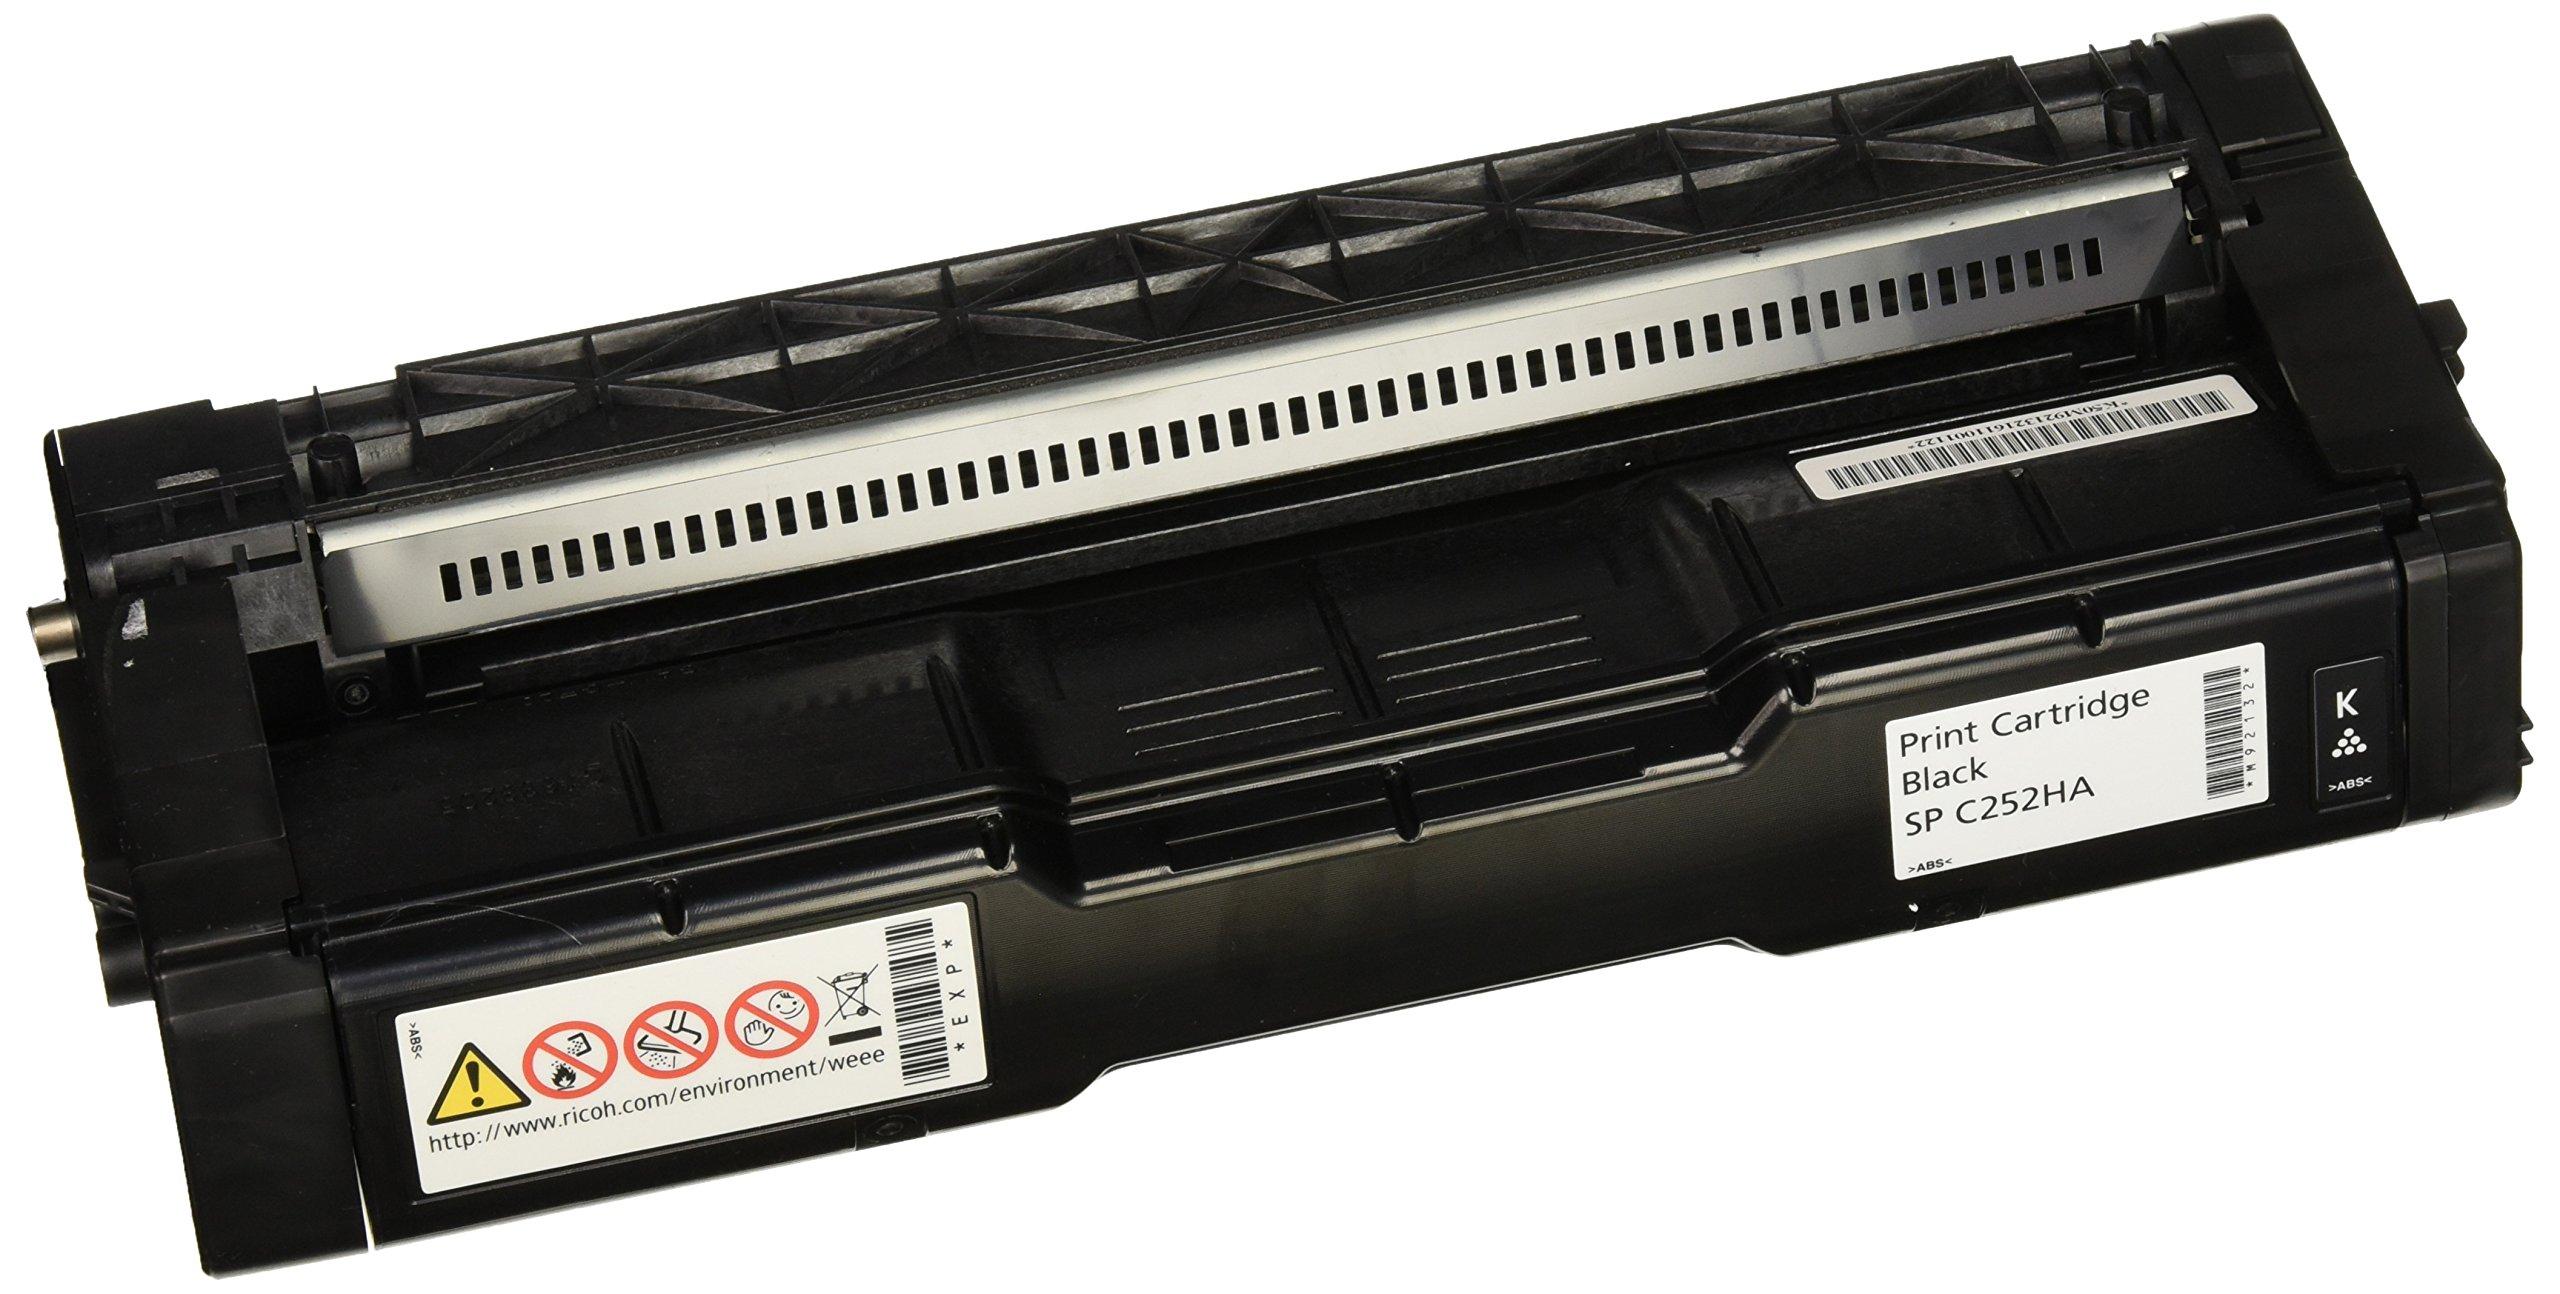 Ricoh Black Toner Cartridge, 6500 Yield (407653)